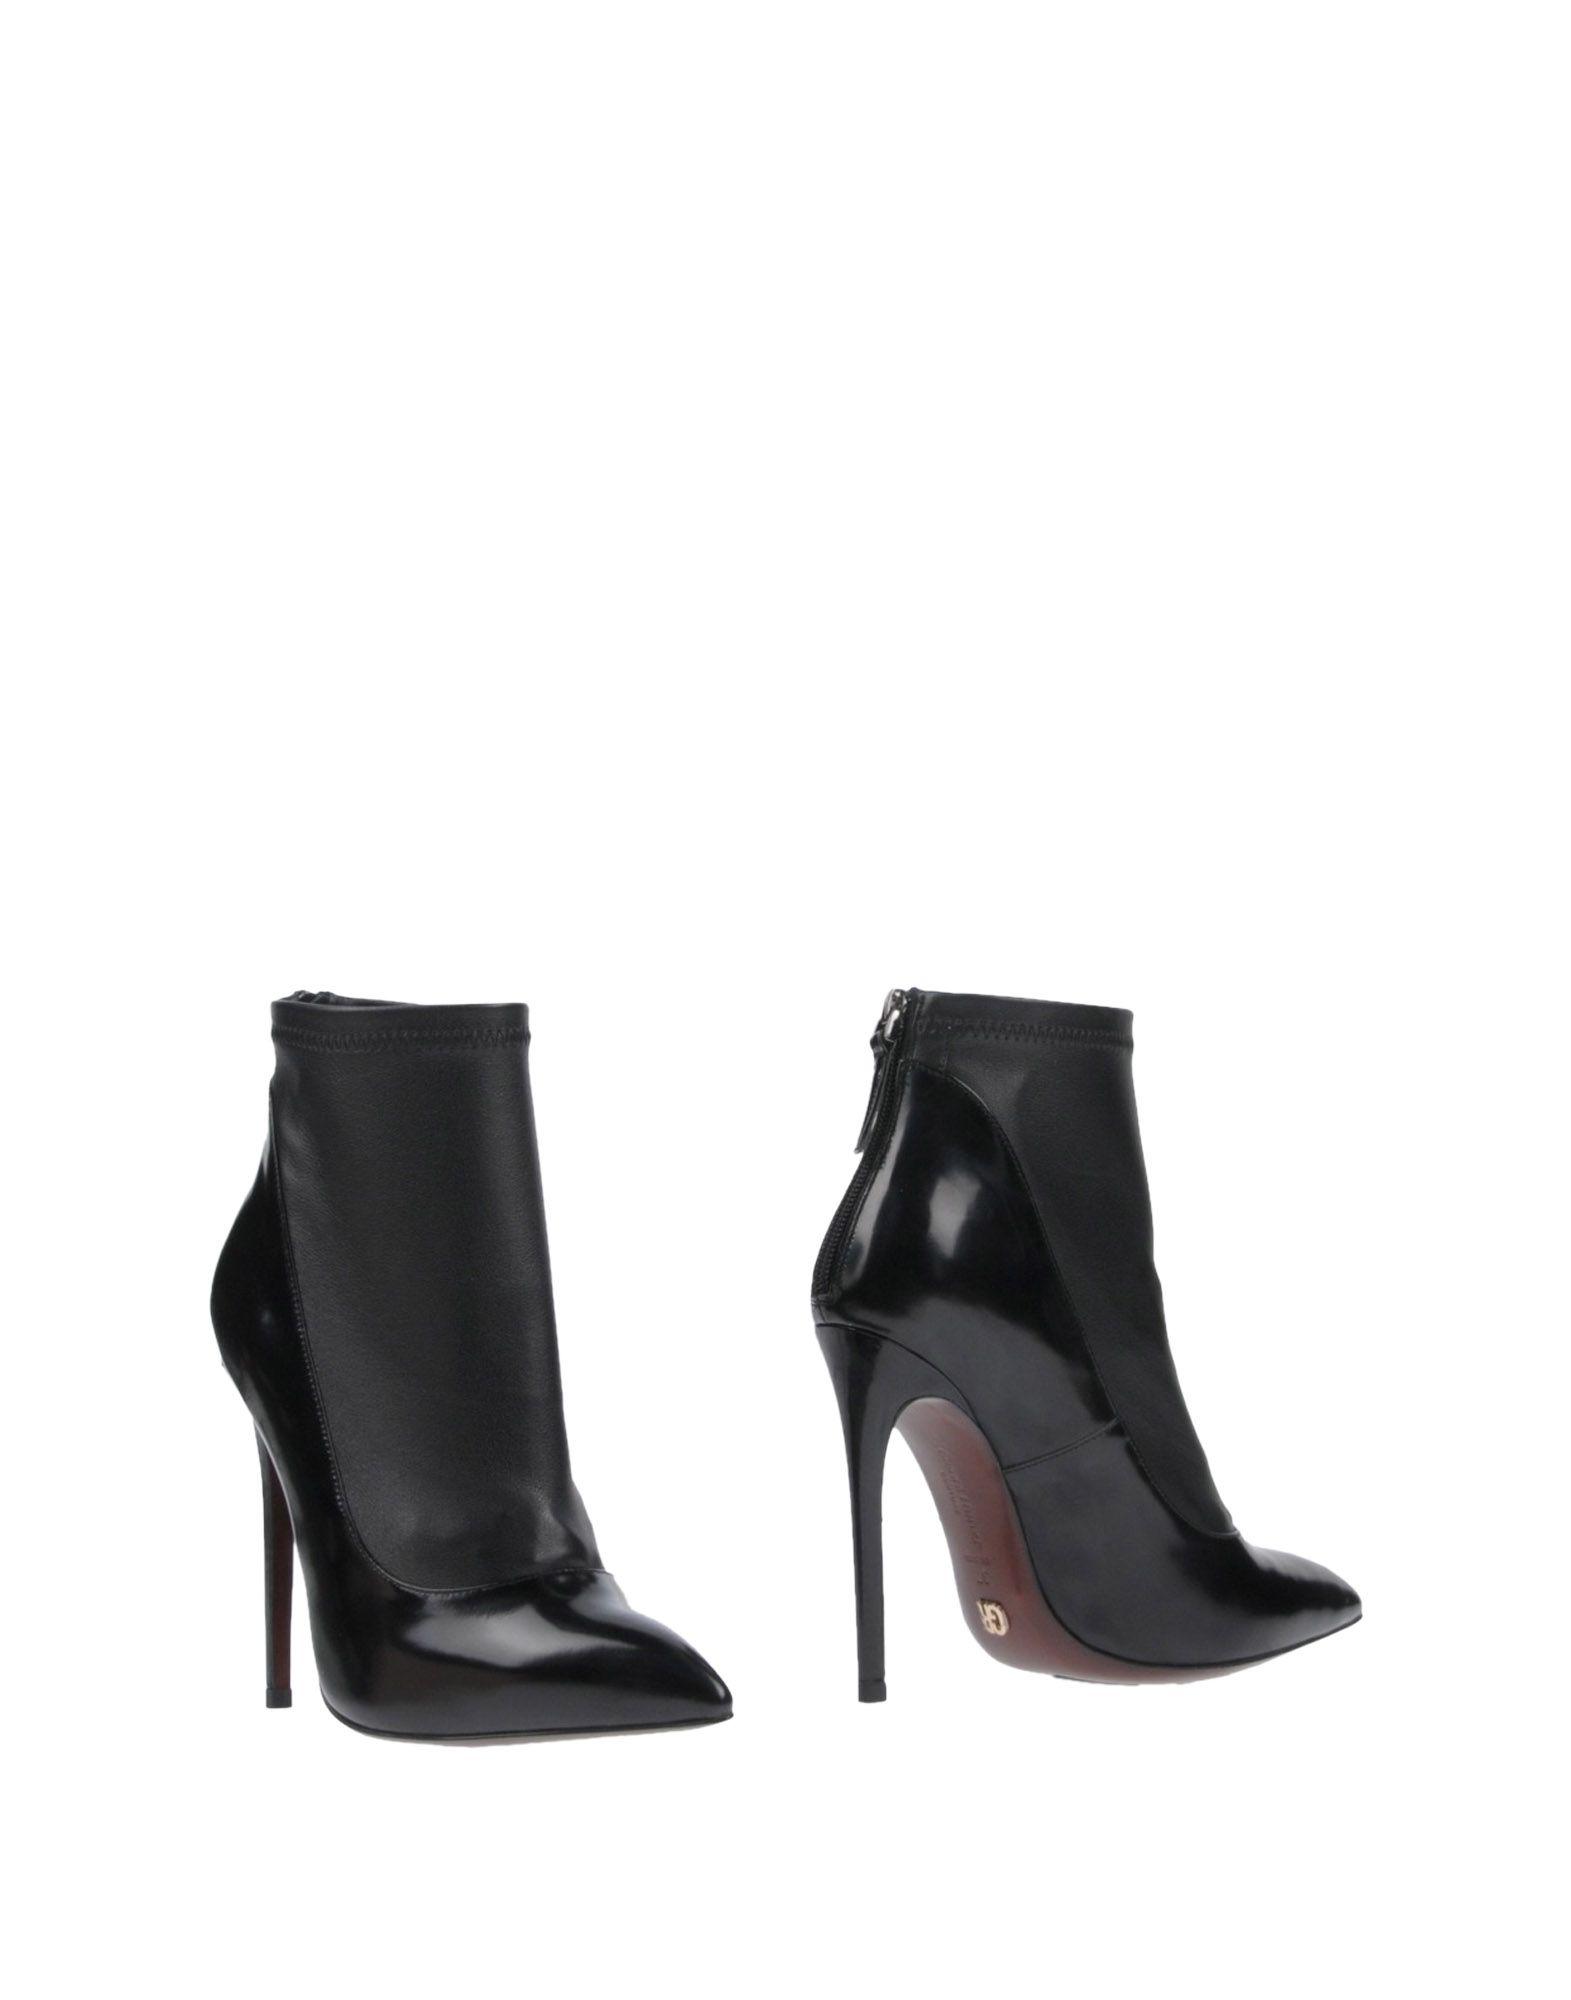 Bottine Gianni Renzi®  Couture Femme - Bottines Gianni Renzi®  Couture sur